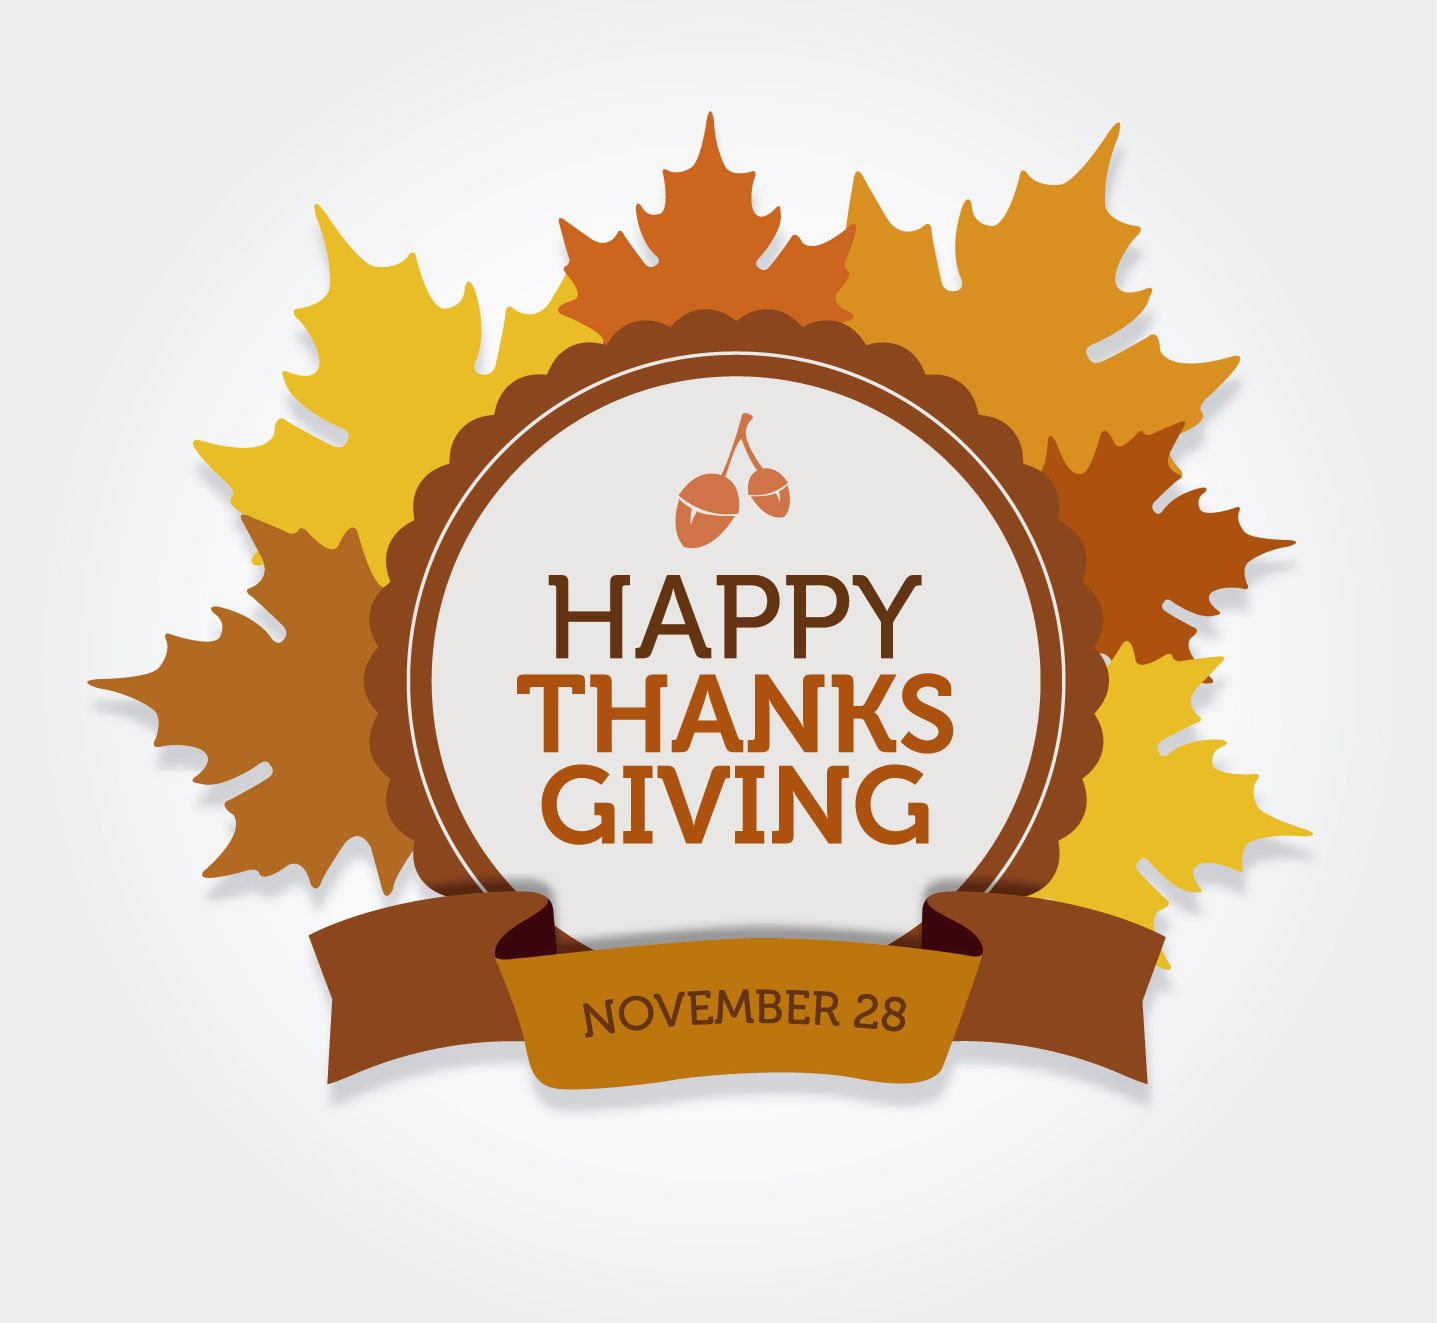 Feliz etiqueta redonda de acción de gracias